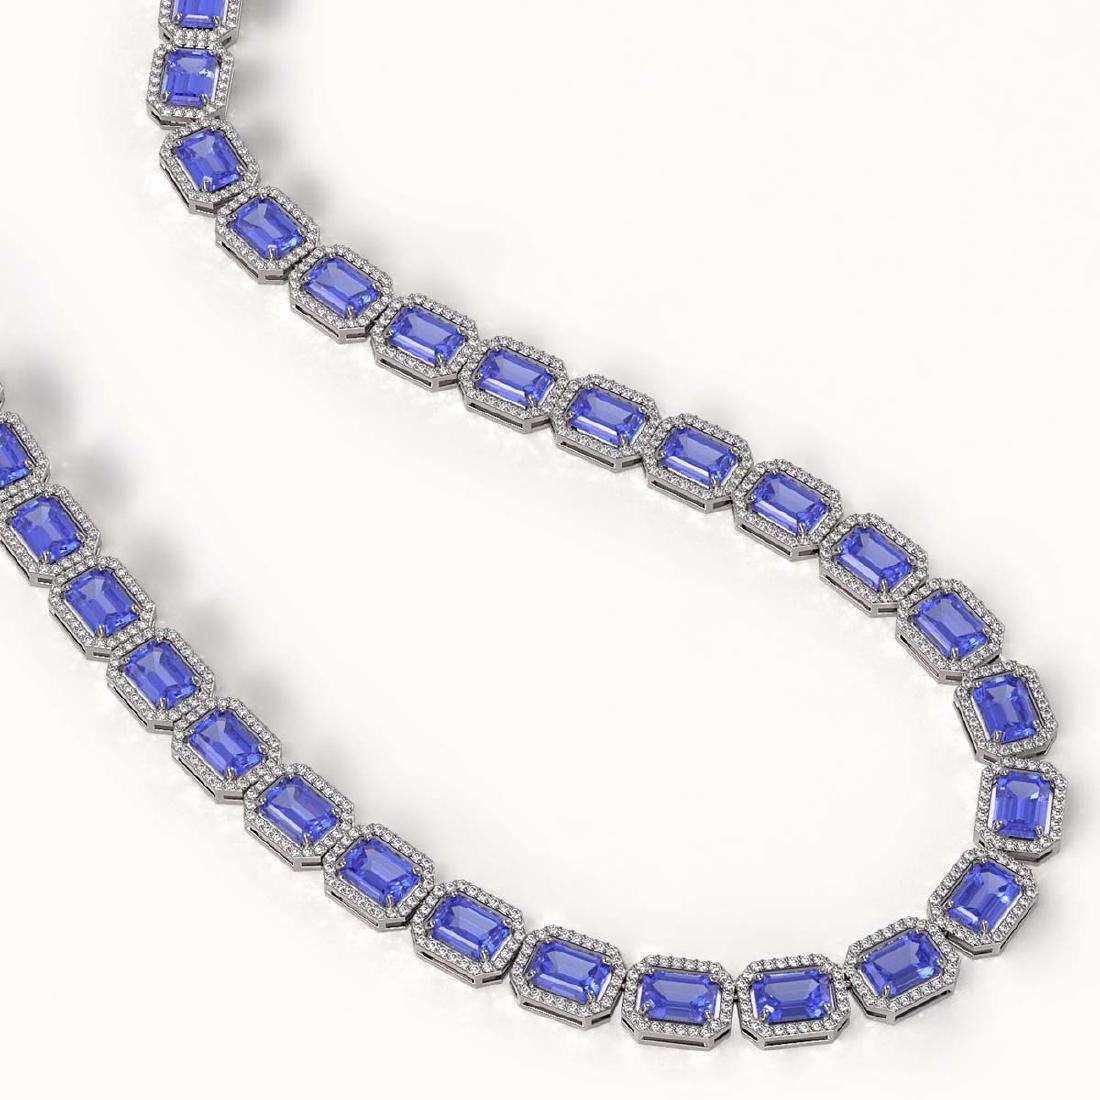 56.69 CTW Tanzanite & Diamond Halo Necklace 10K White - 2